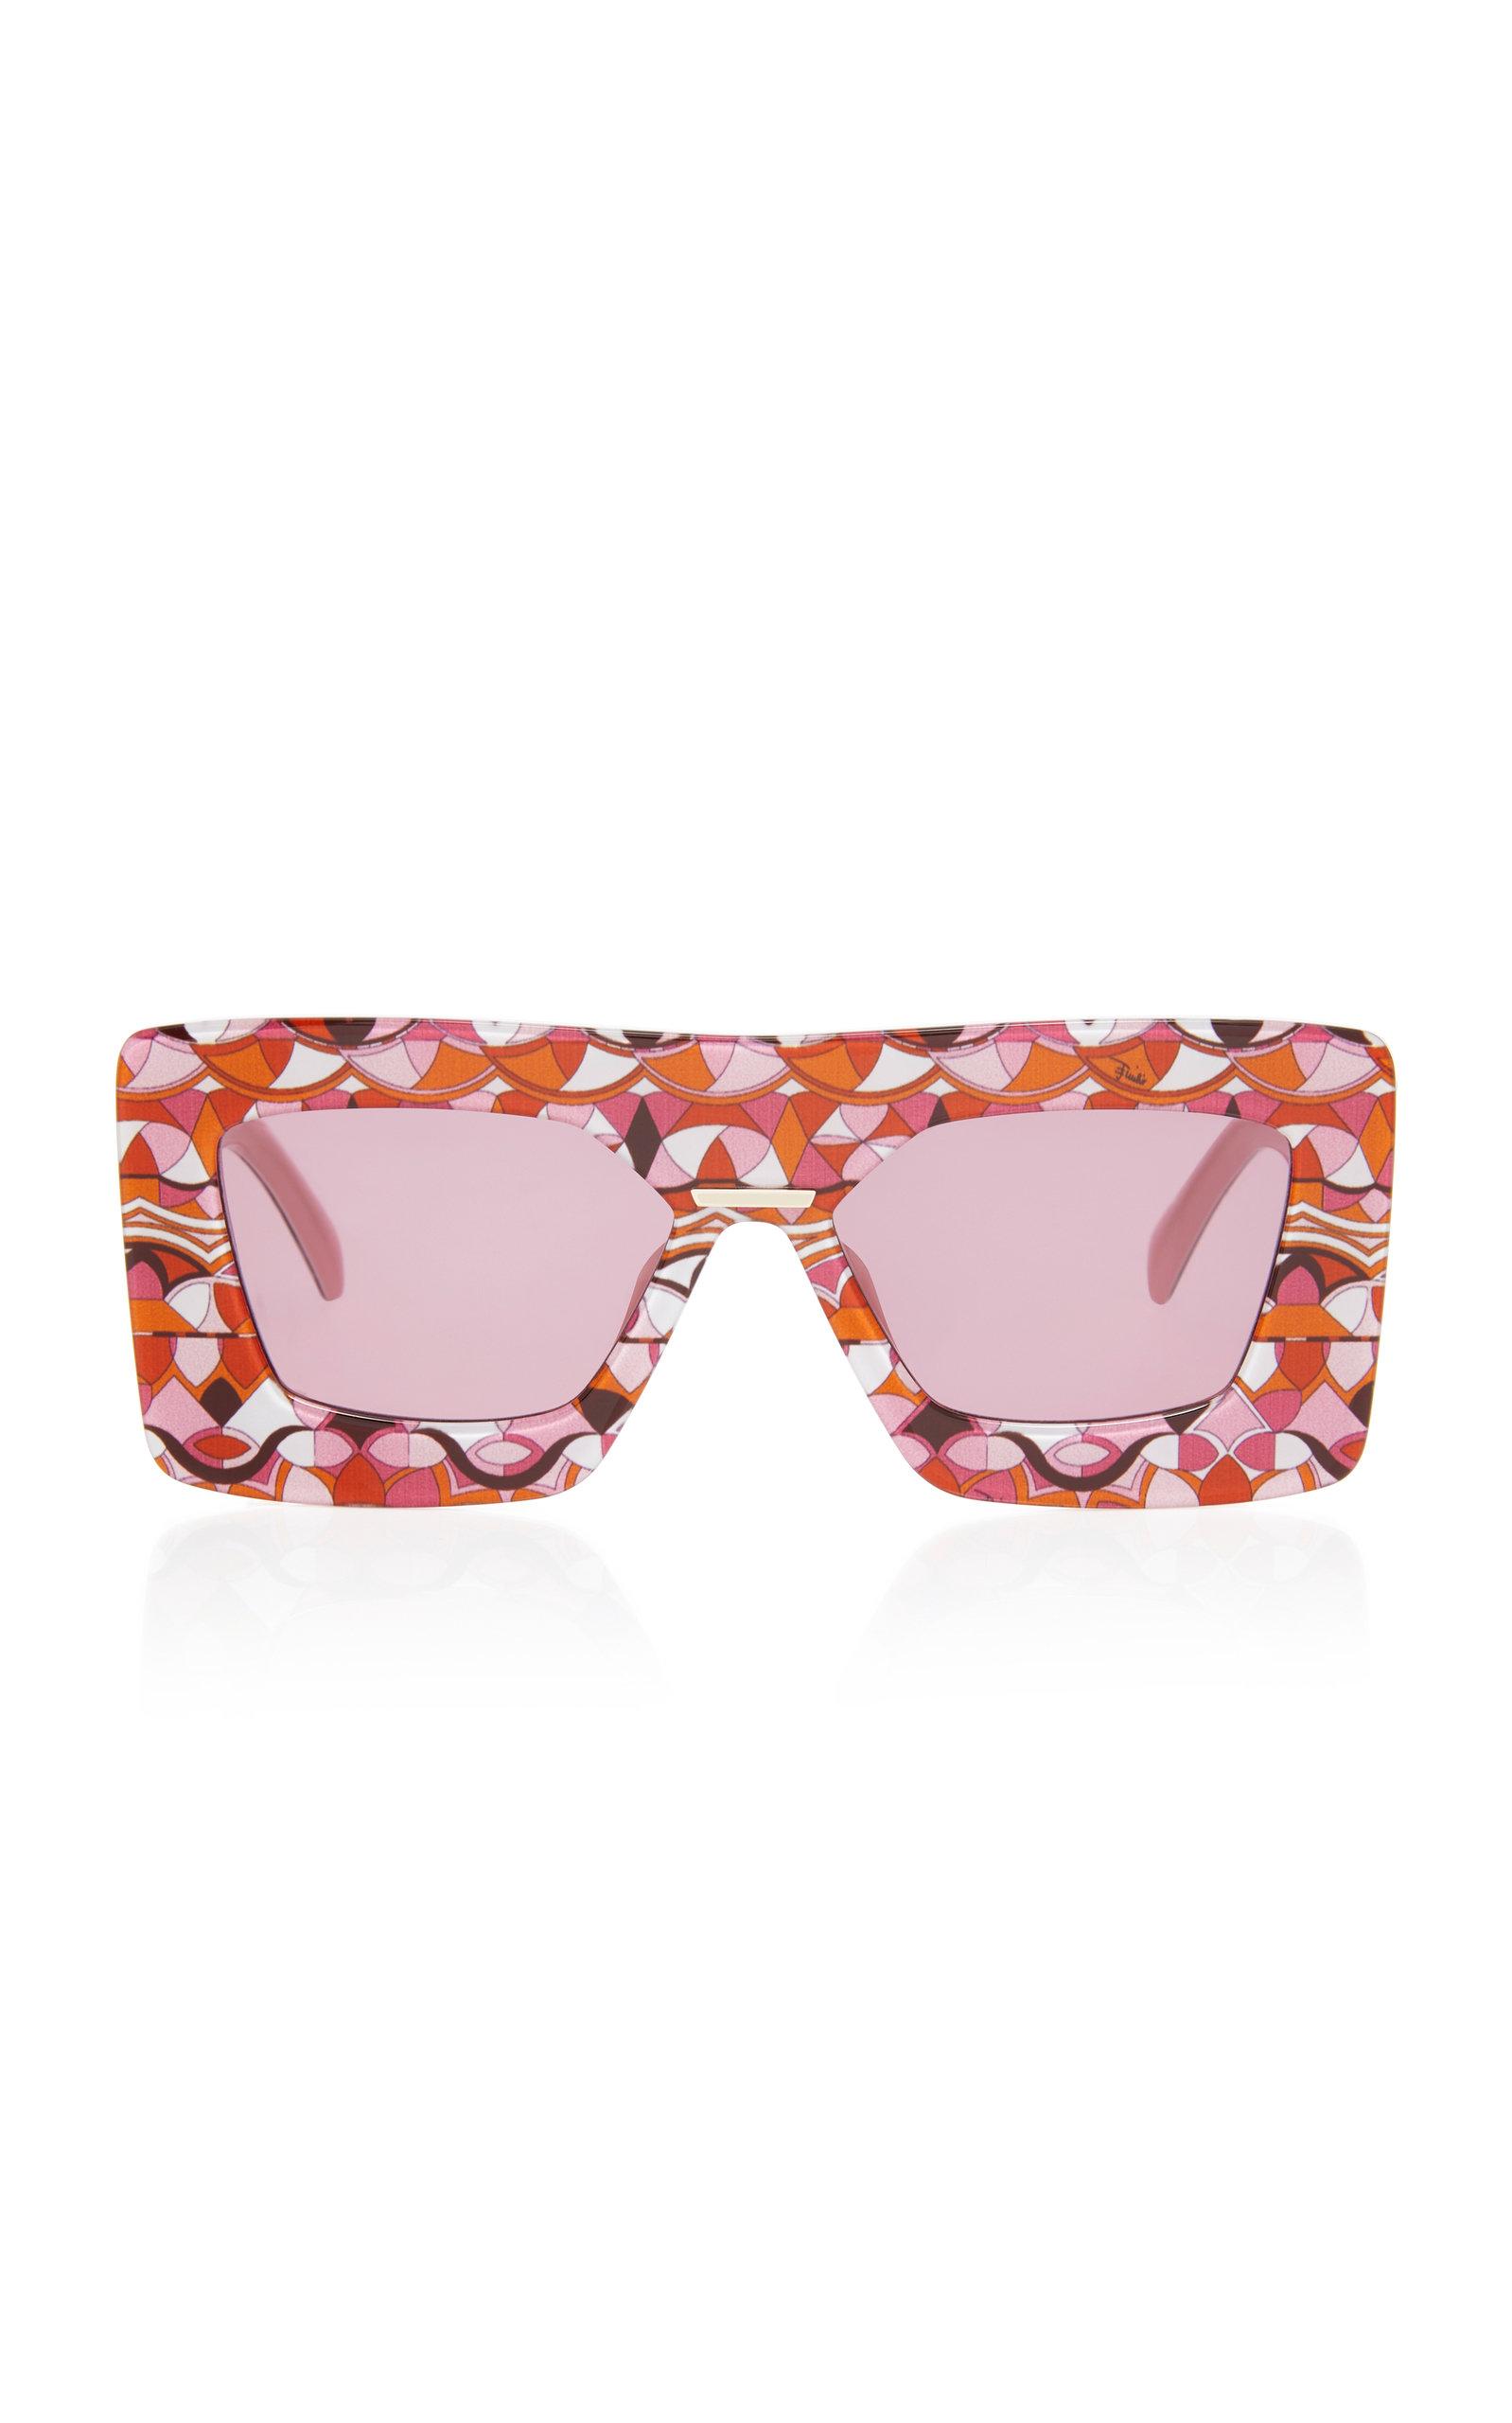 EMILIO PUCCI SUNGLASSES Oversized Printed Square Frame Acetate Sunglasses in Burgundy